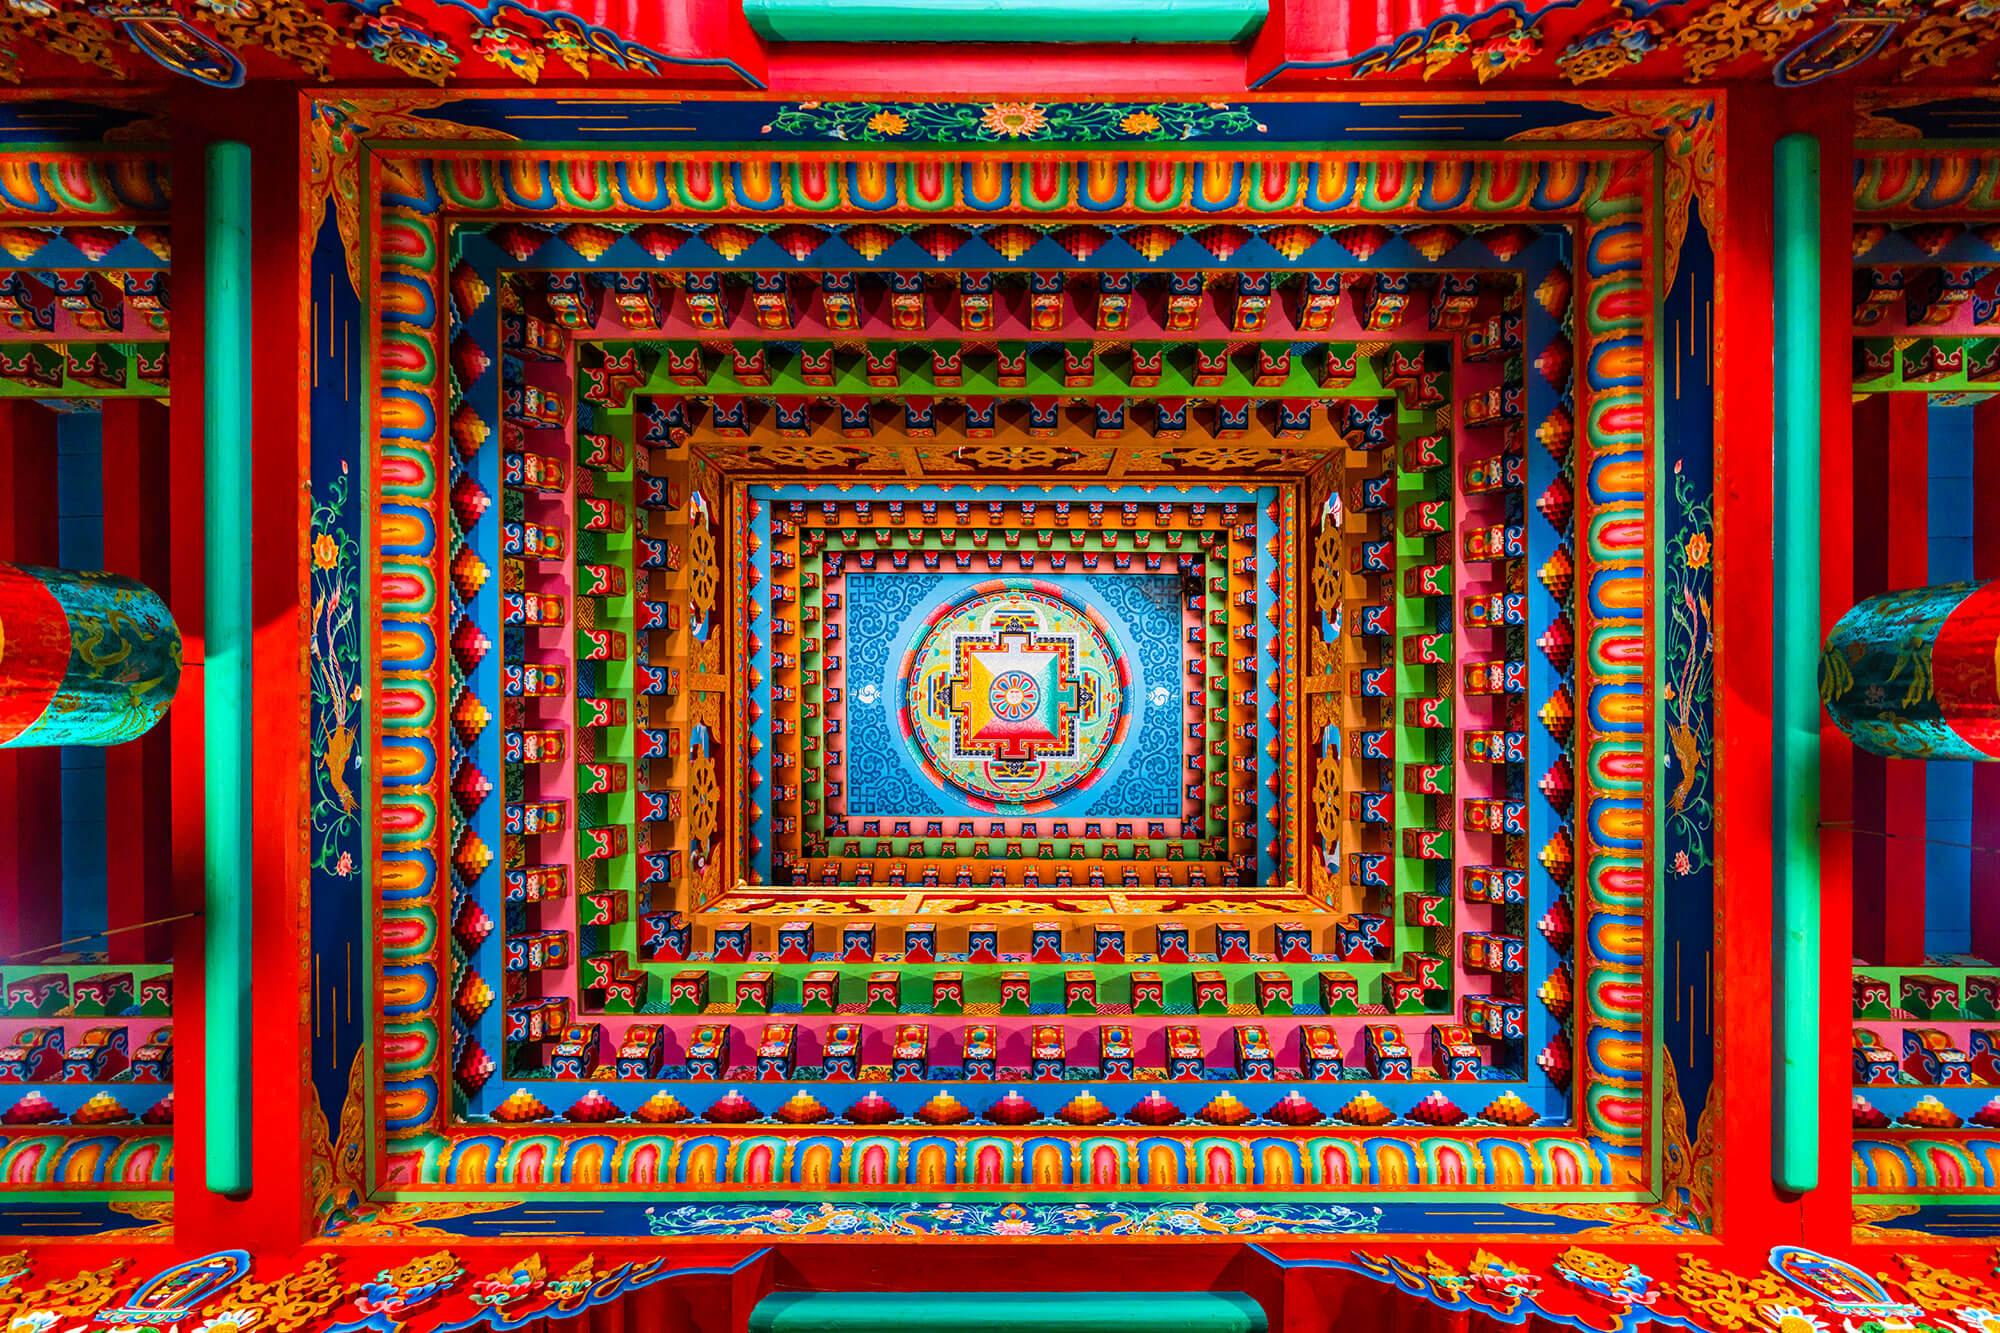 Photo of colourful architecture by Luke Tscharke